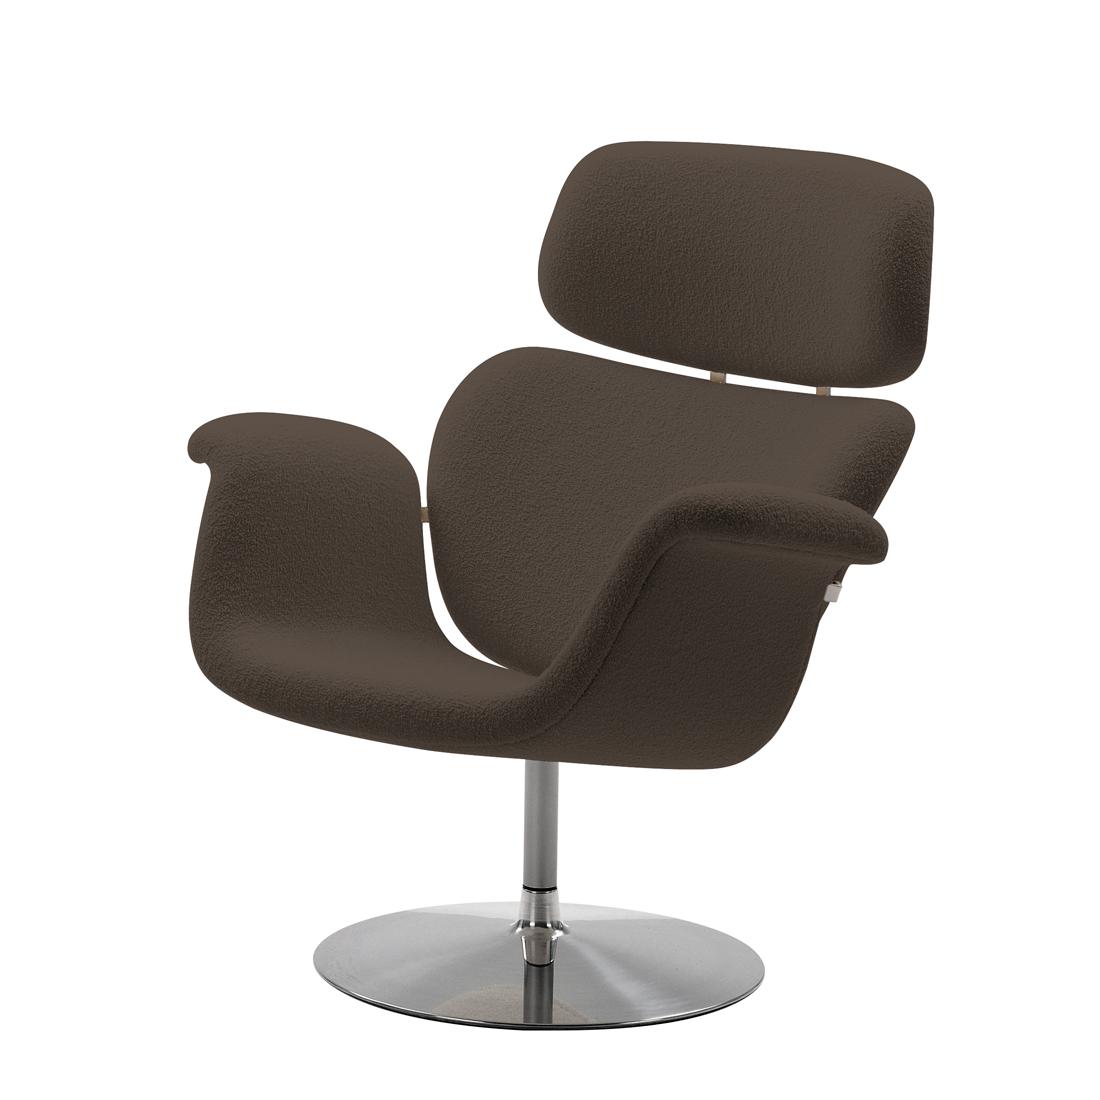 Artifort designer sessel schurwolle grau stuhl for Designer stuhl grau